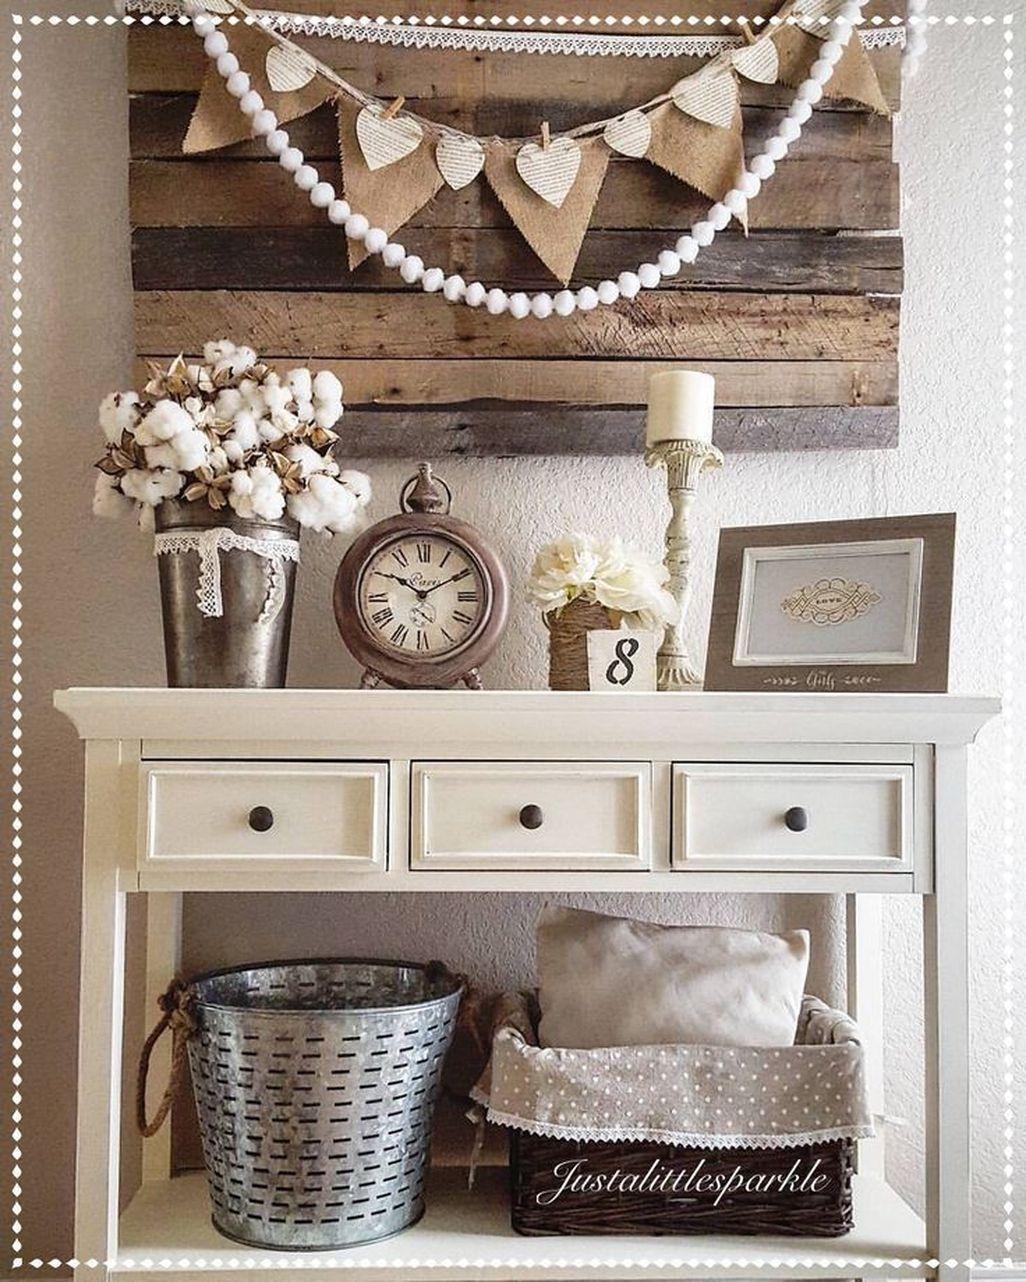 43 Beautiful Rustic Entryway Decoration Ideas: Beautiful Rustic Entryway Decoration Ideas 16